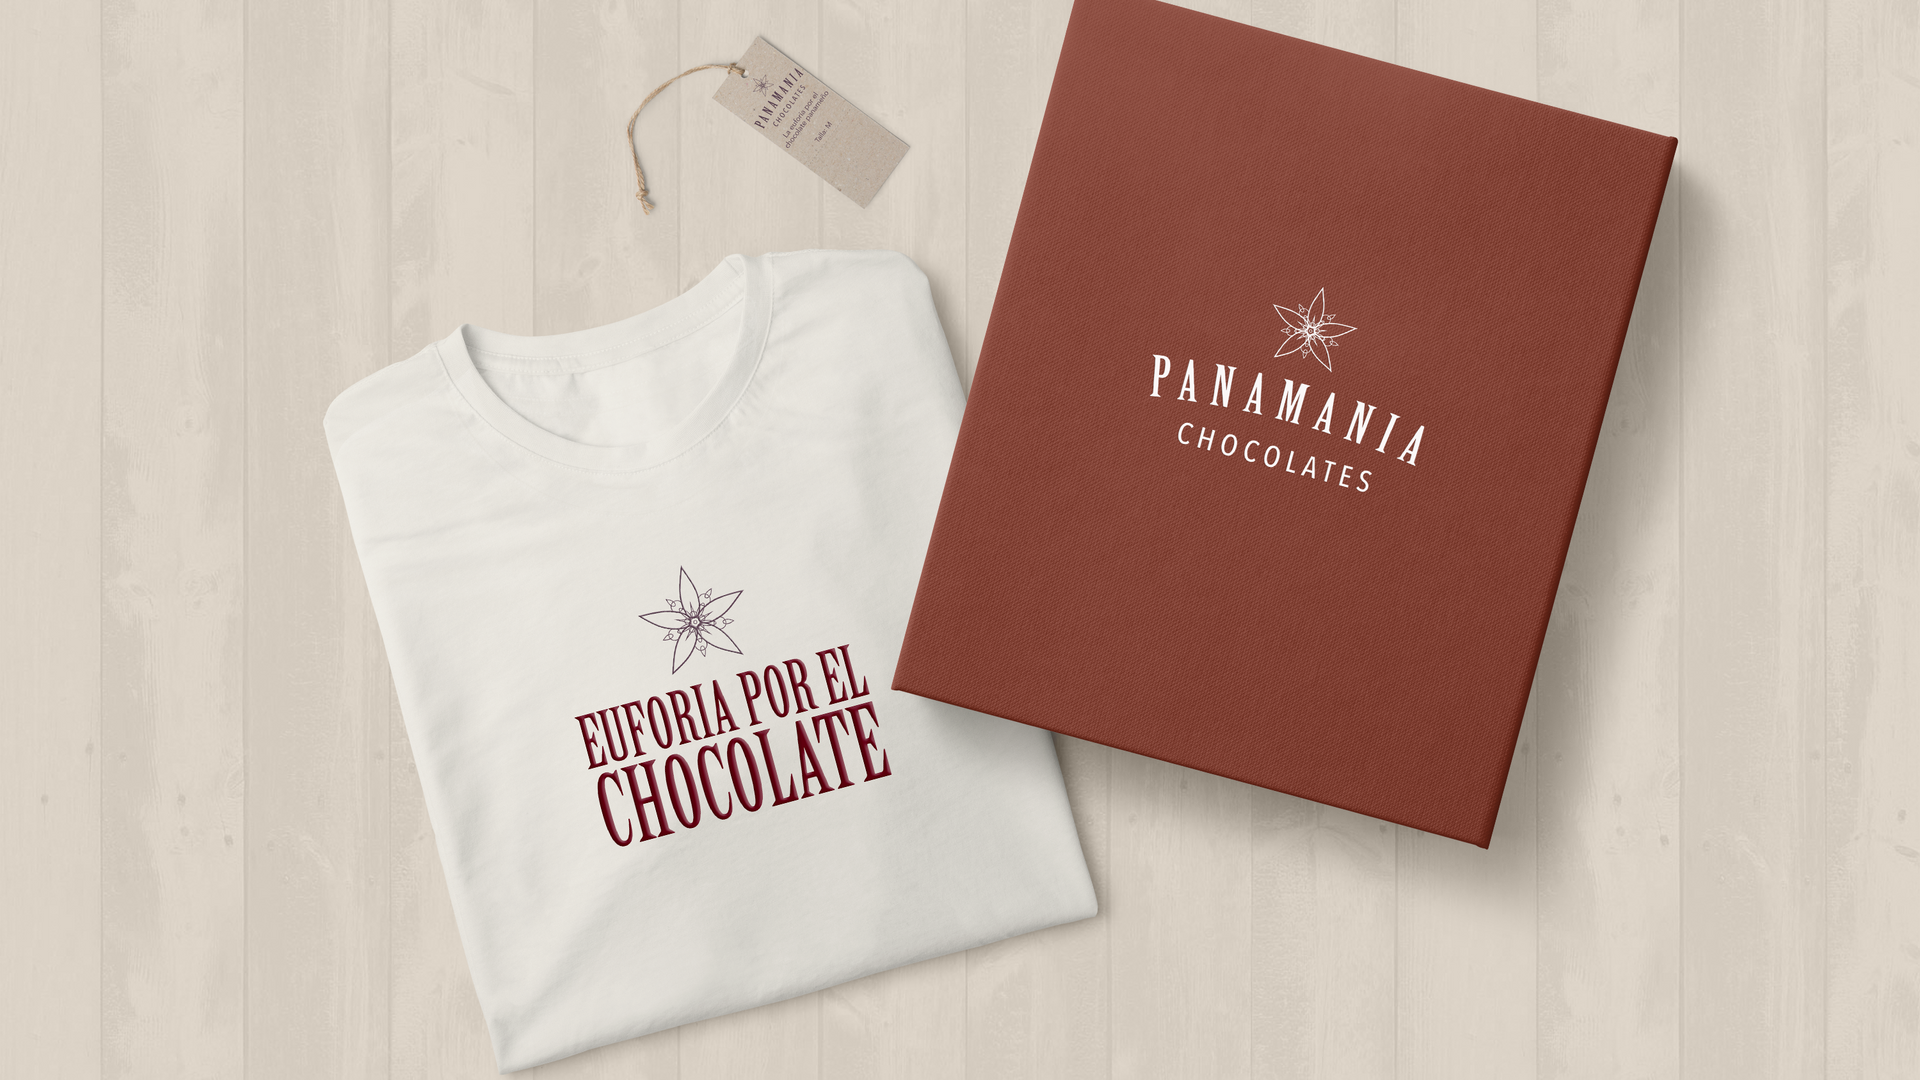 Panamania shirt.png